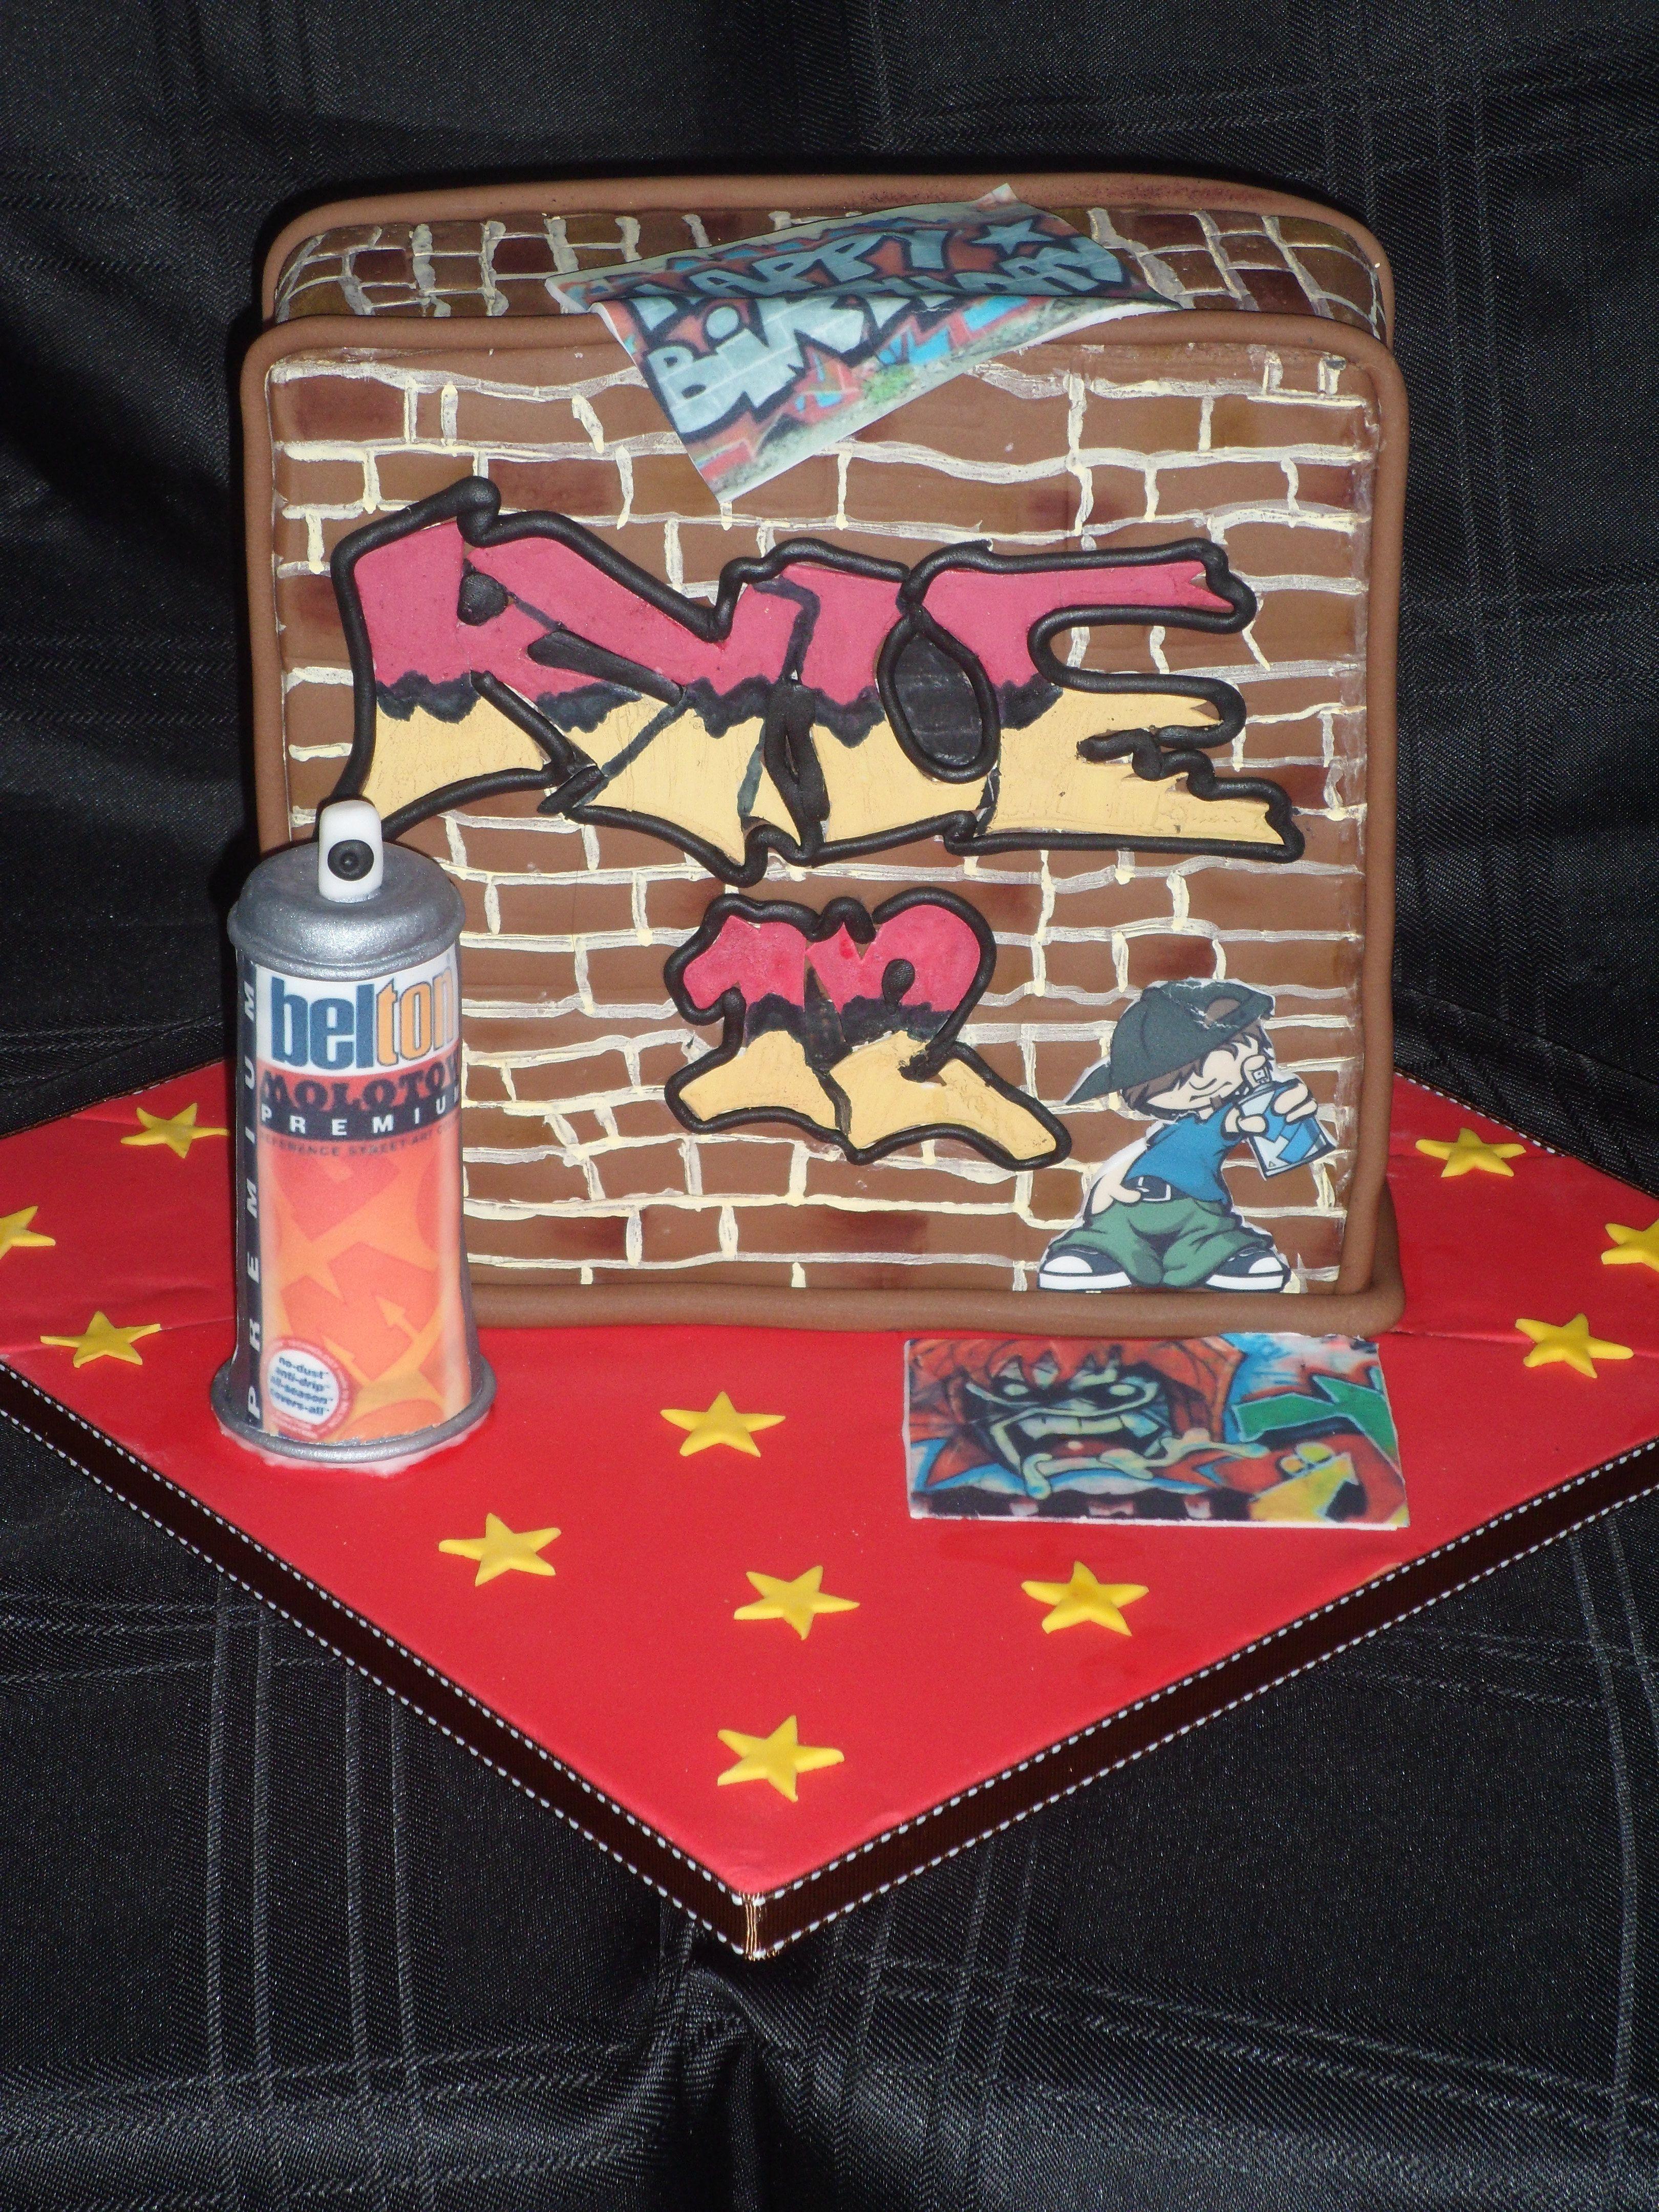 Brick Wall Graffiti Theme Cake With Sugar Spray Paint Can